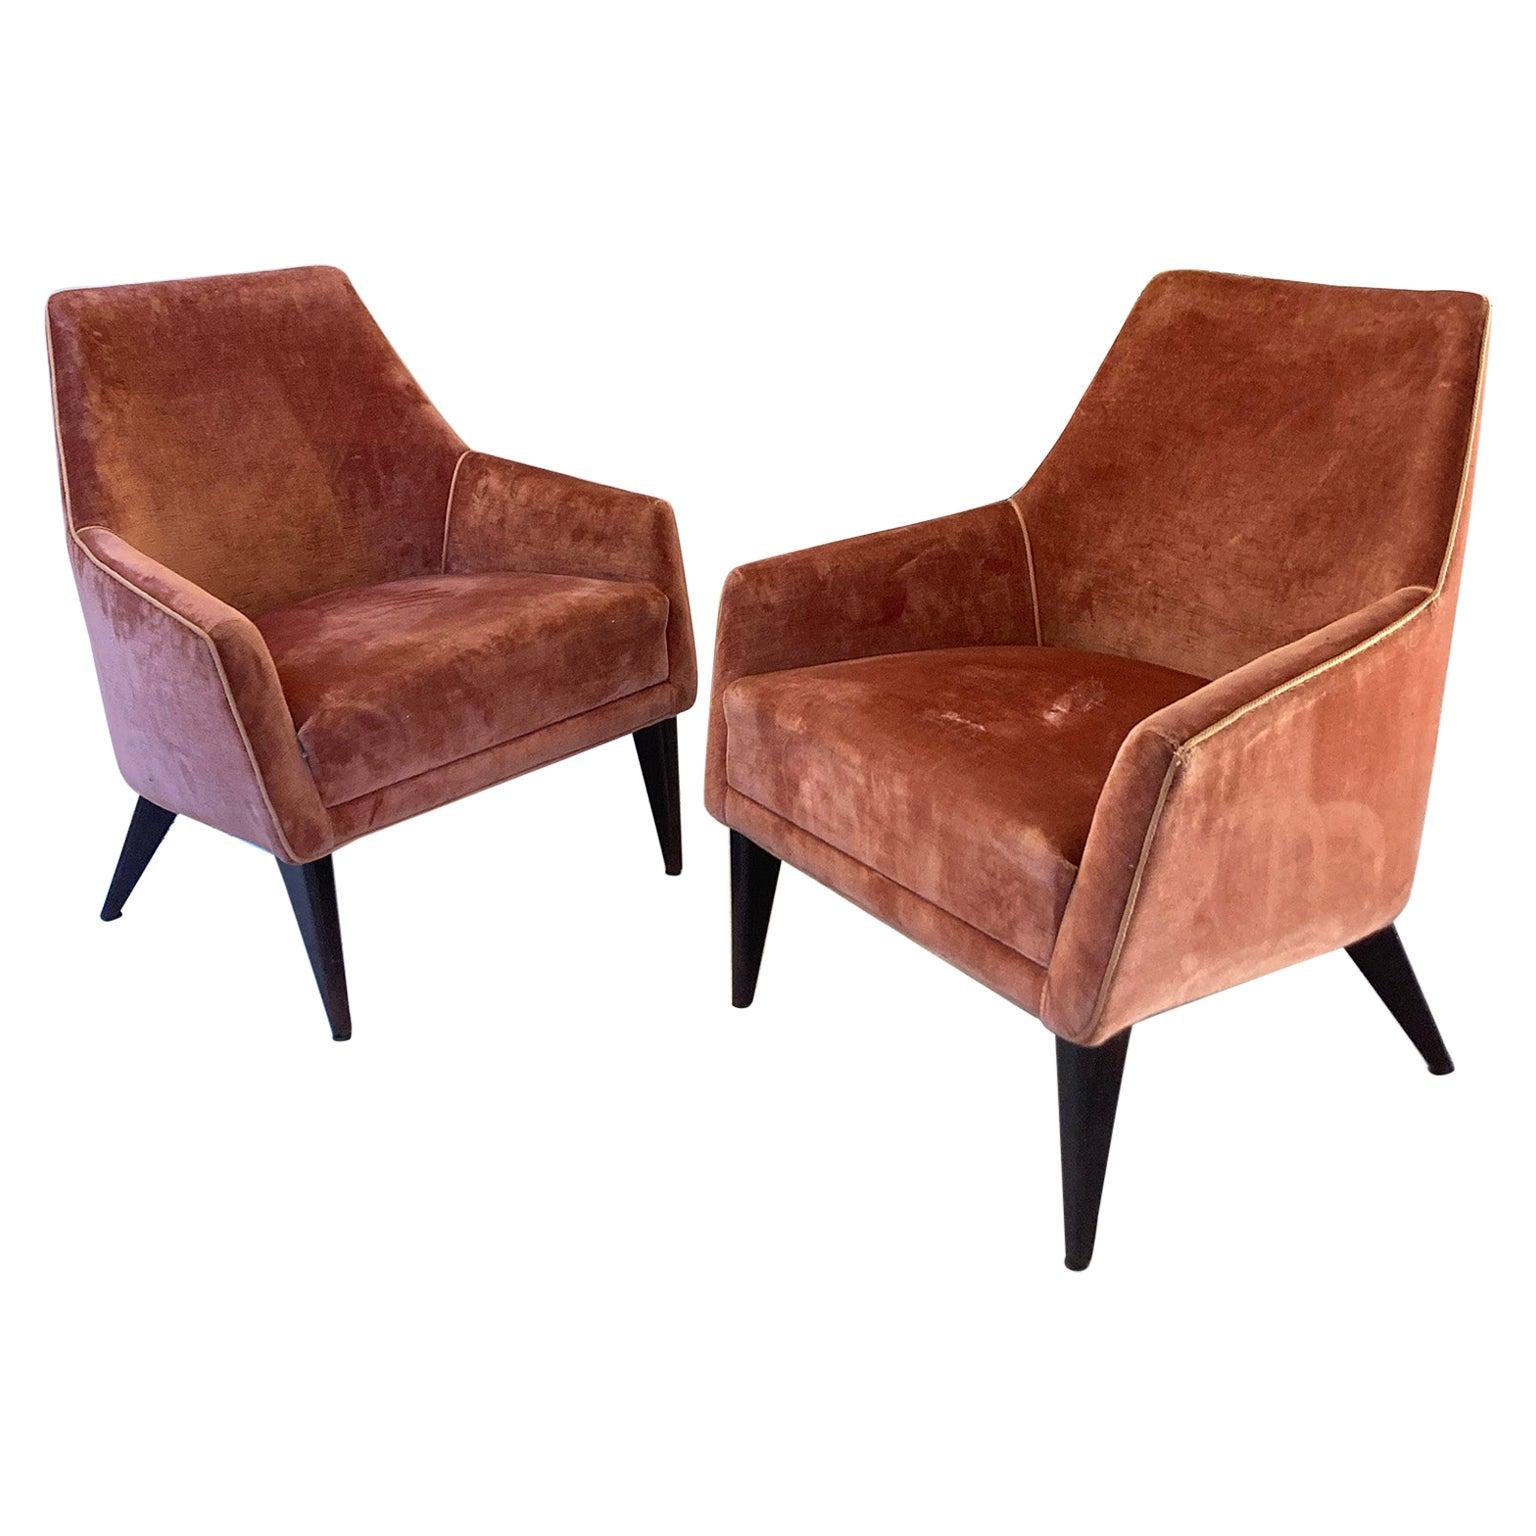 Midcentury Italian Velvet Armchairs in Gio Ponti Style Manufacture ISA, 1958